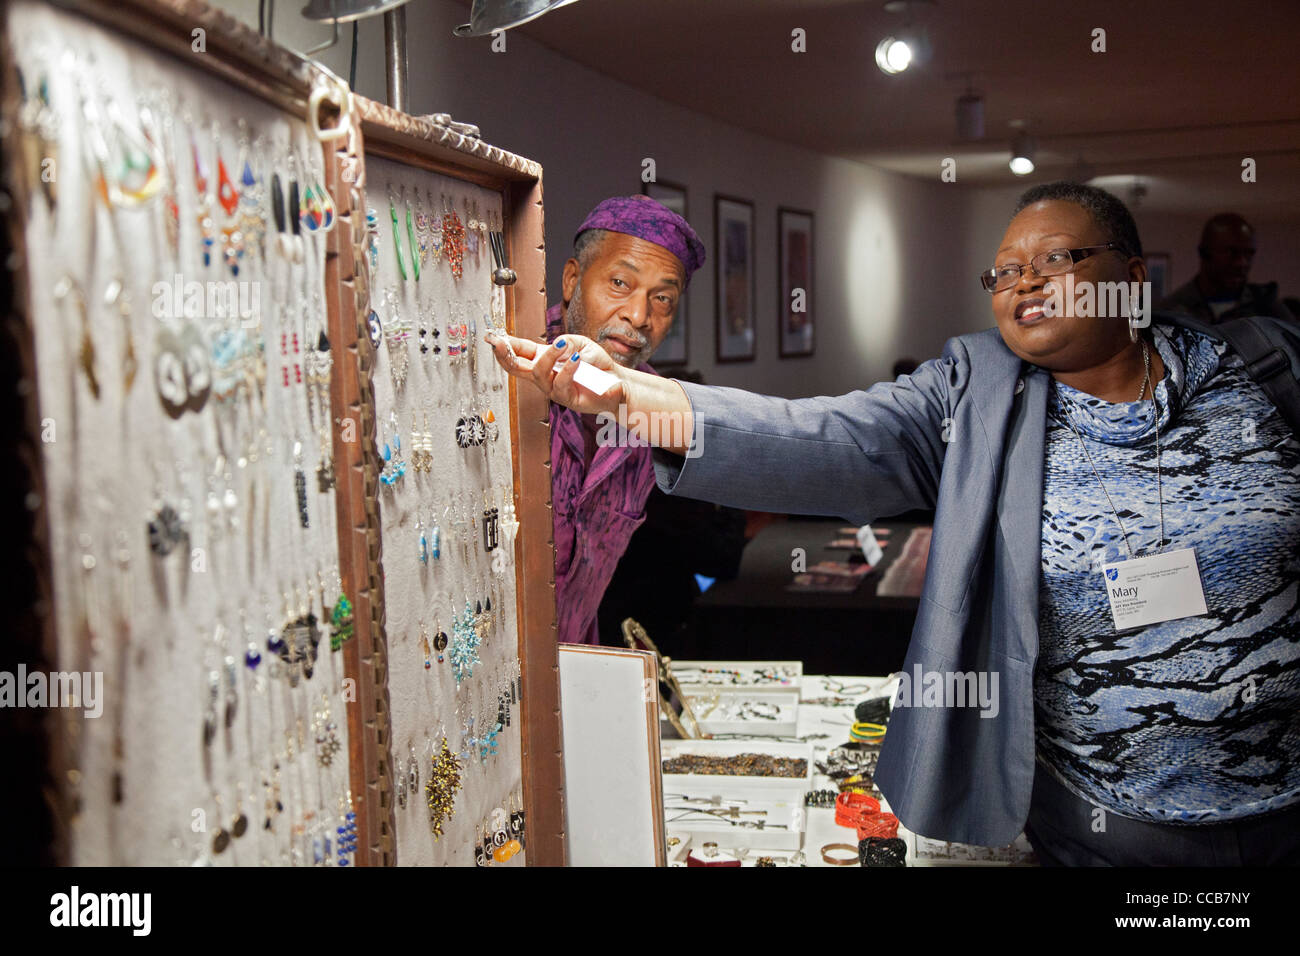 Vendor Sells Jewelry - Stock Image